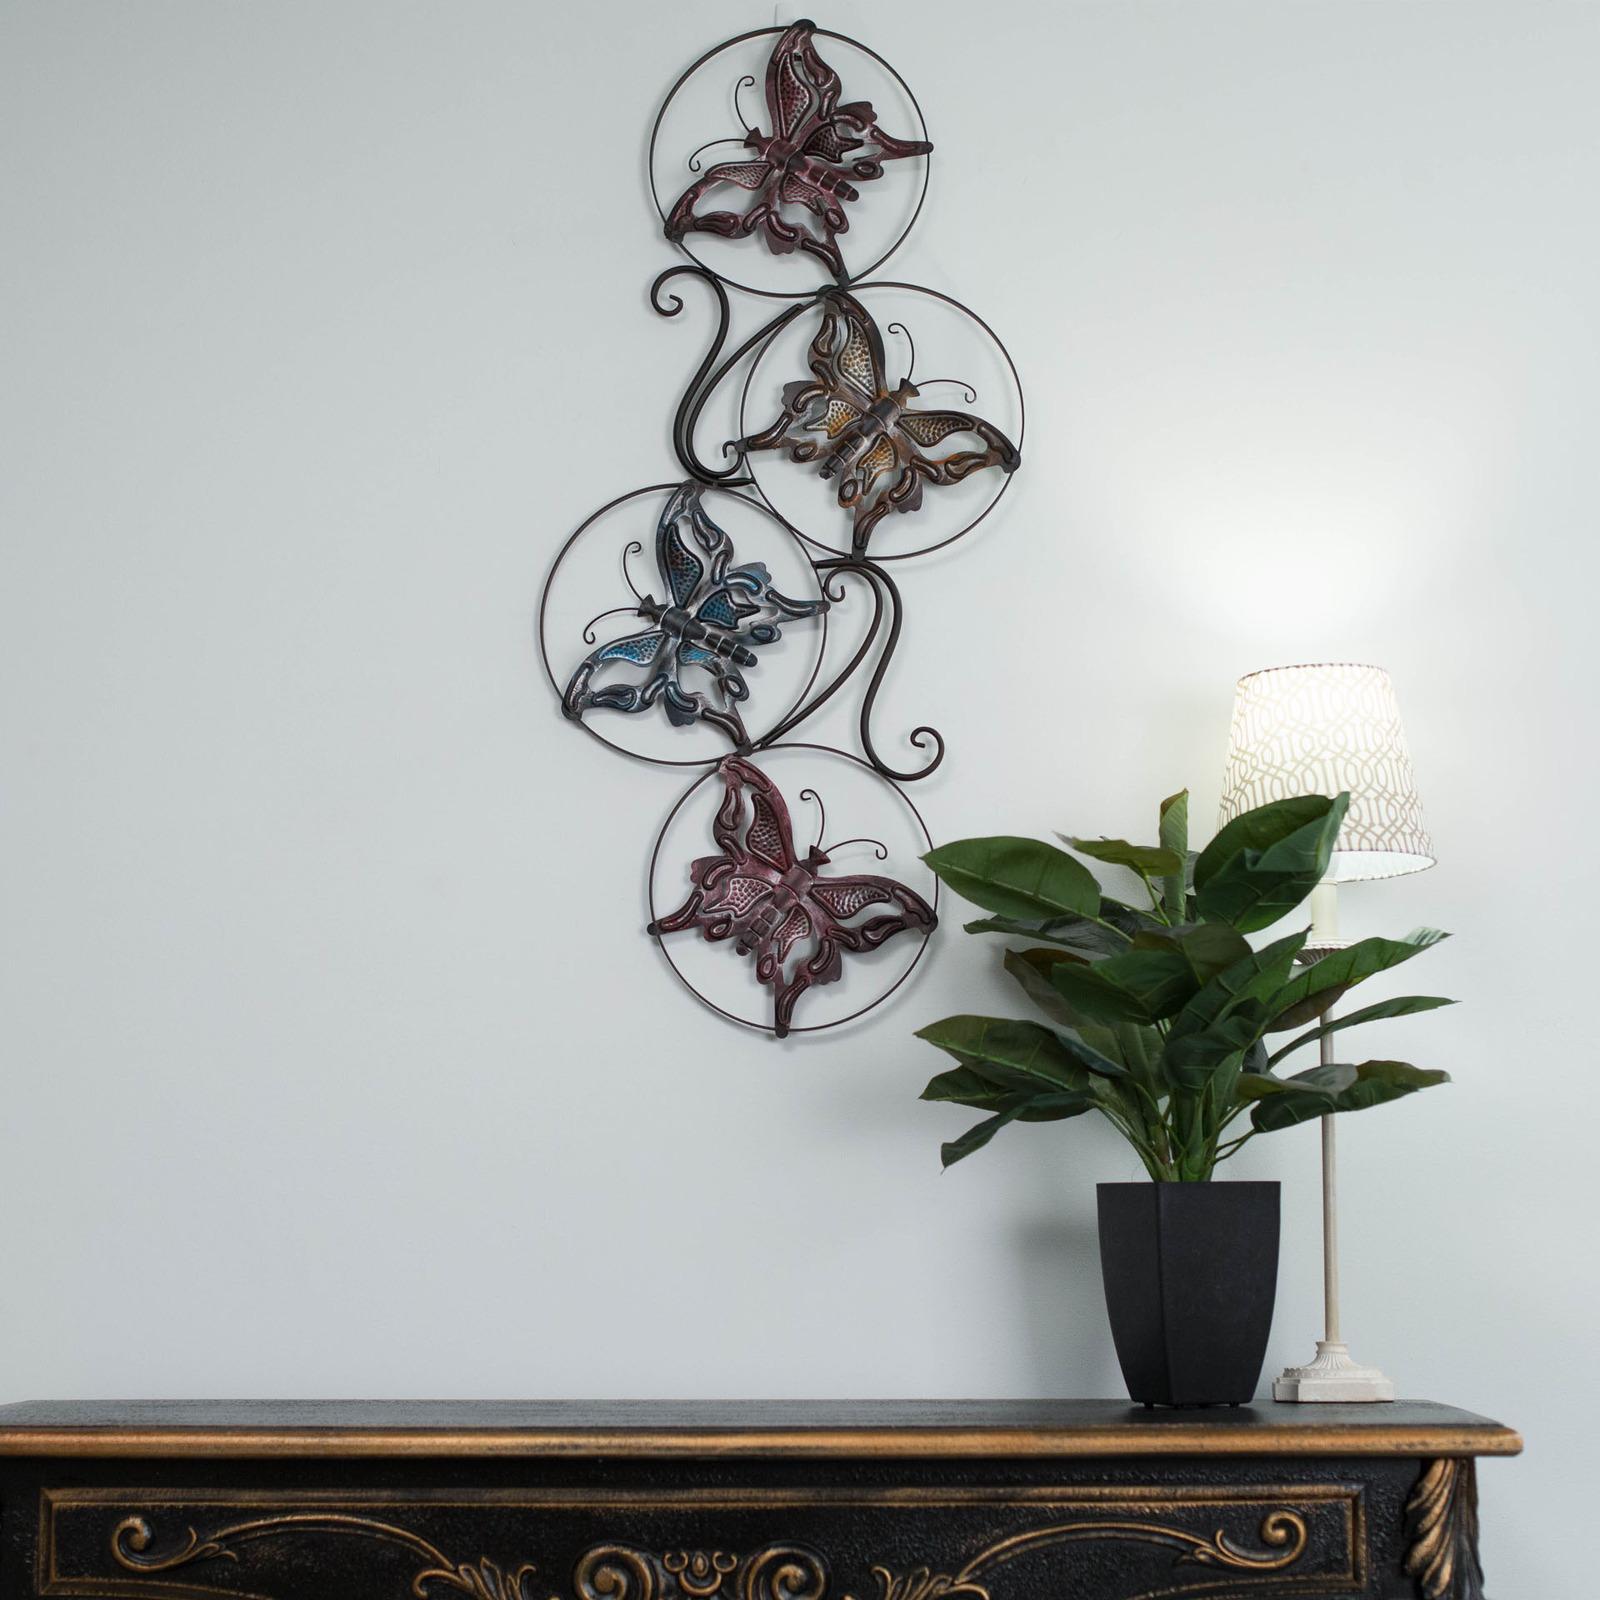 wrought iron metal wall art butterflies 91cm large vintage